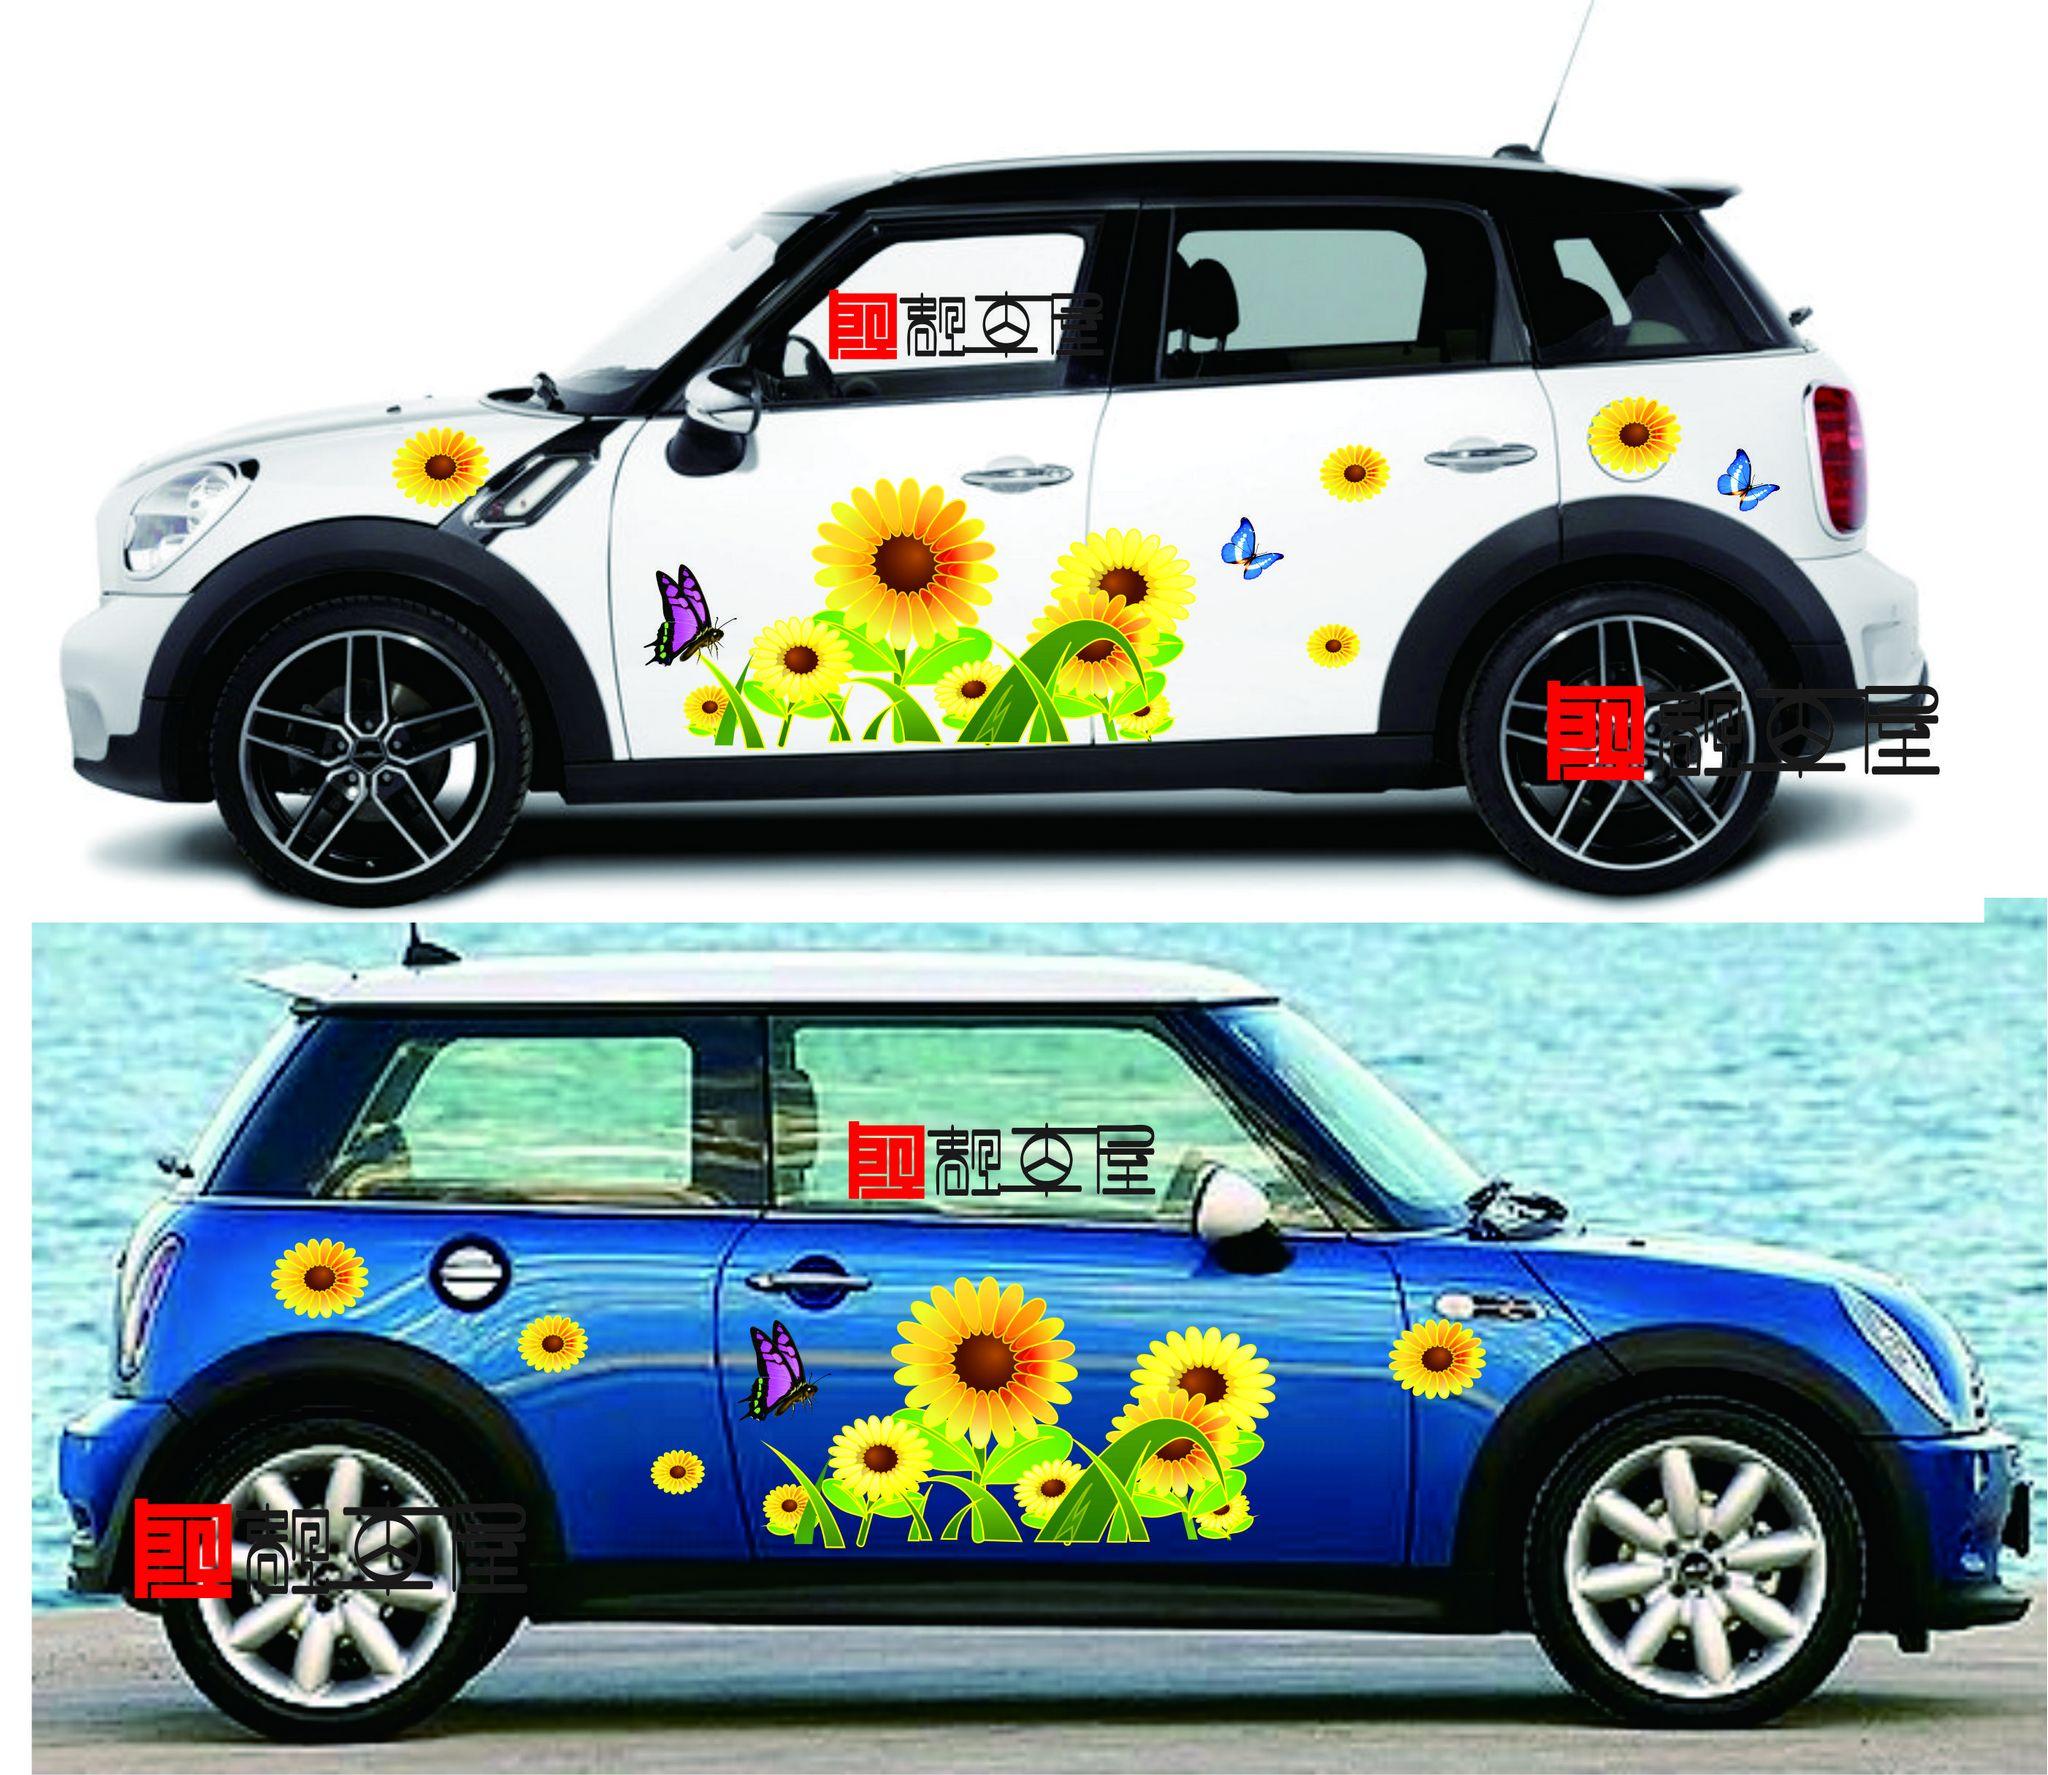 Auto Car Stickers Mini Car Stickers Sunflower Applique Personalized